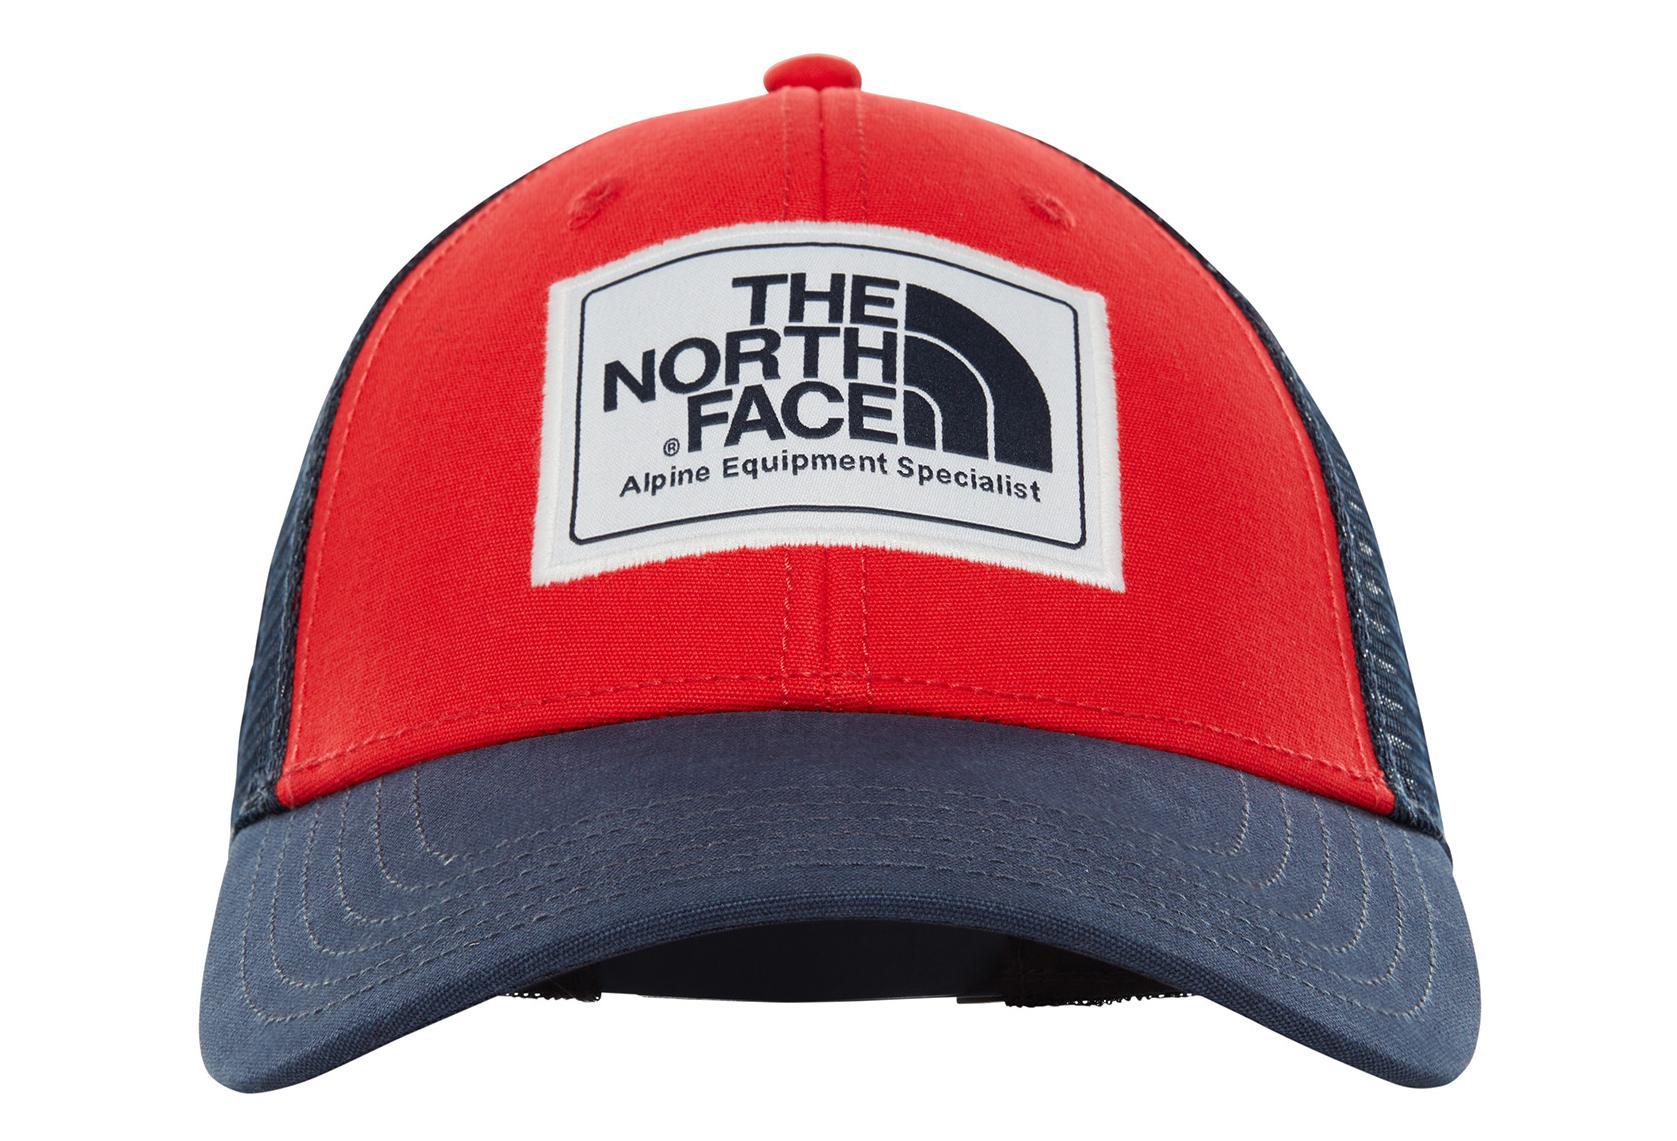 26daf76a Mudder Trucker Hat The North Face Rouge Unisex | Alltricks.com